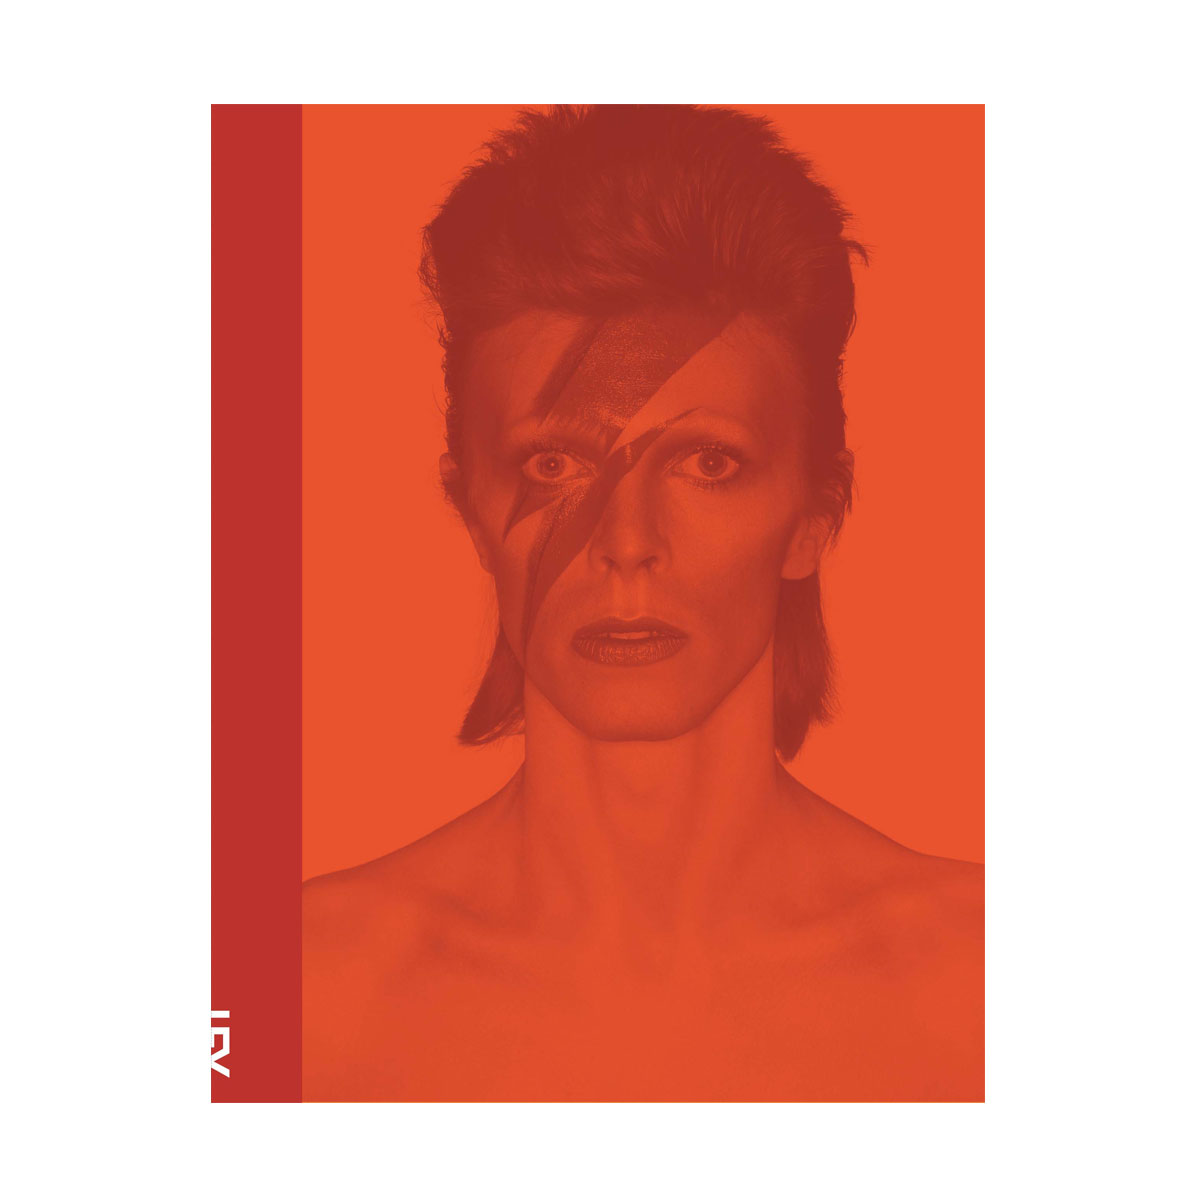 Livro David Bowie + Camiseta